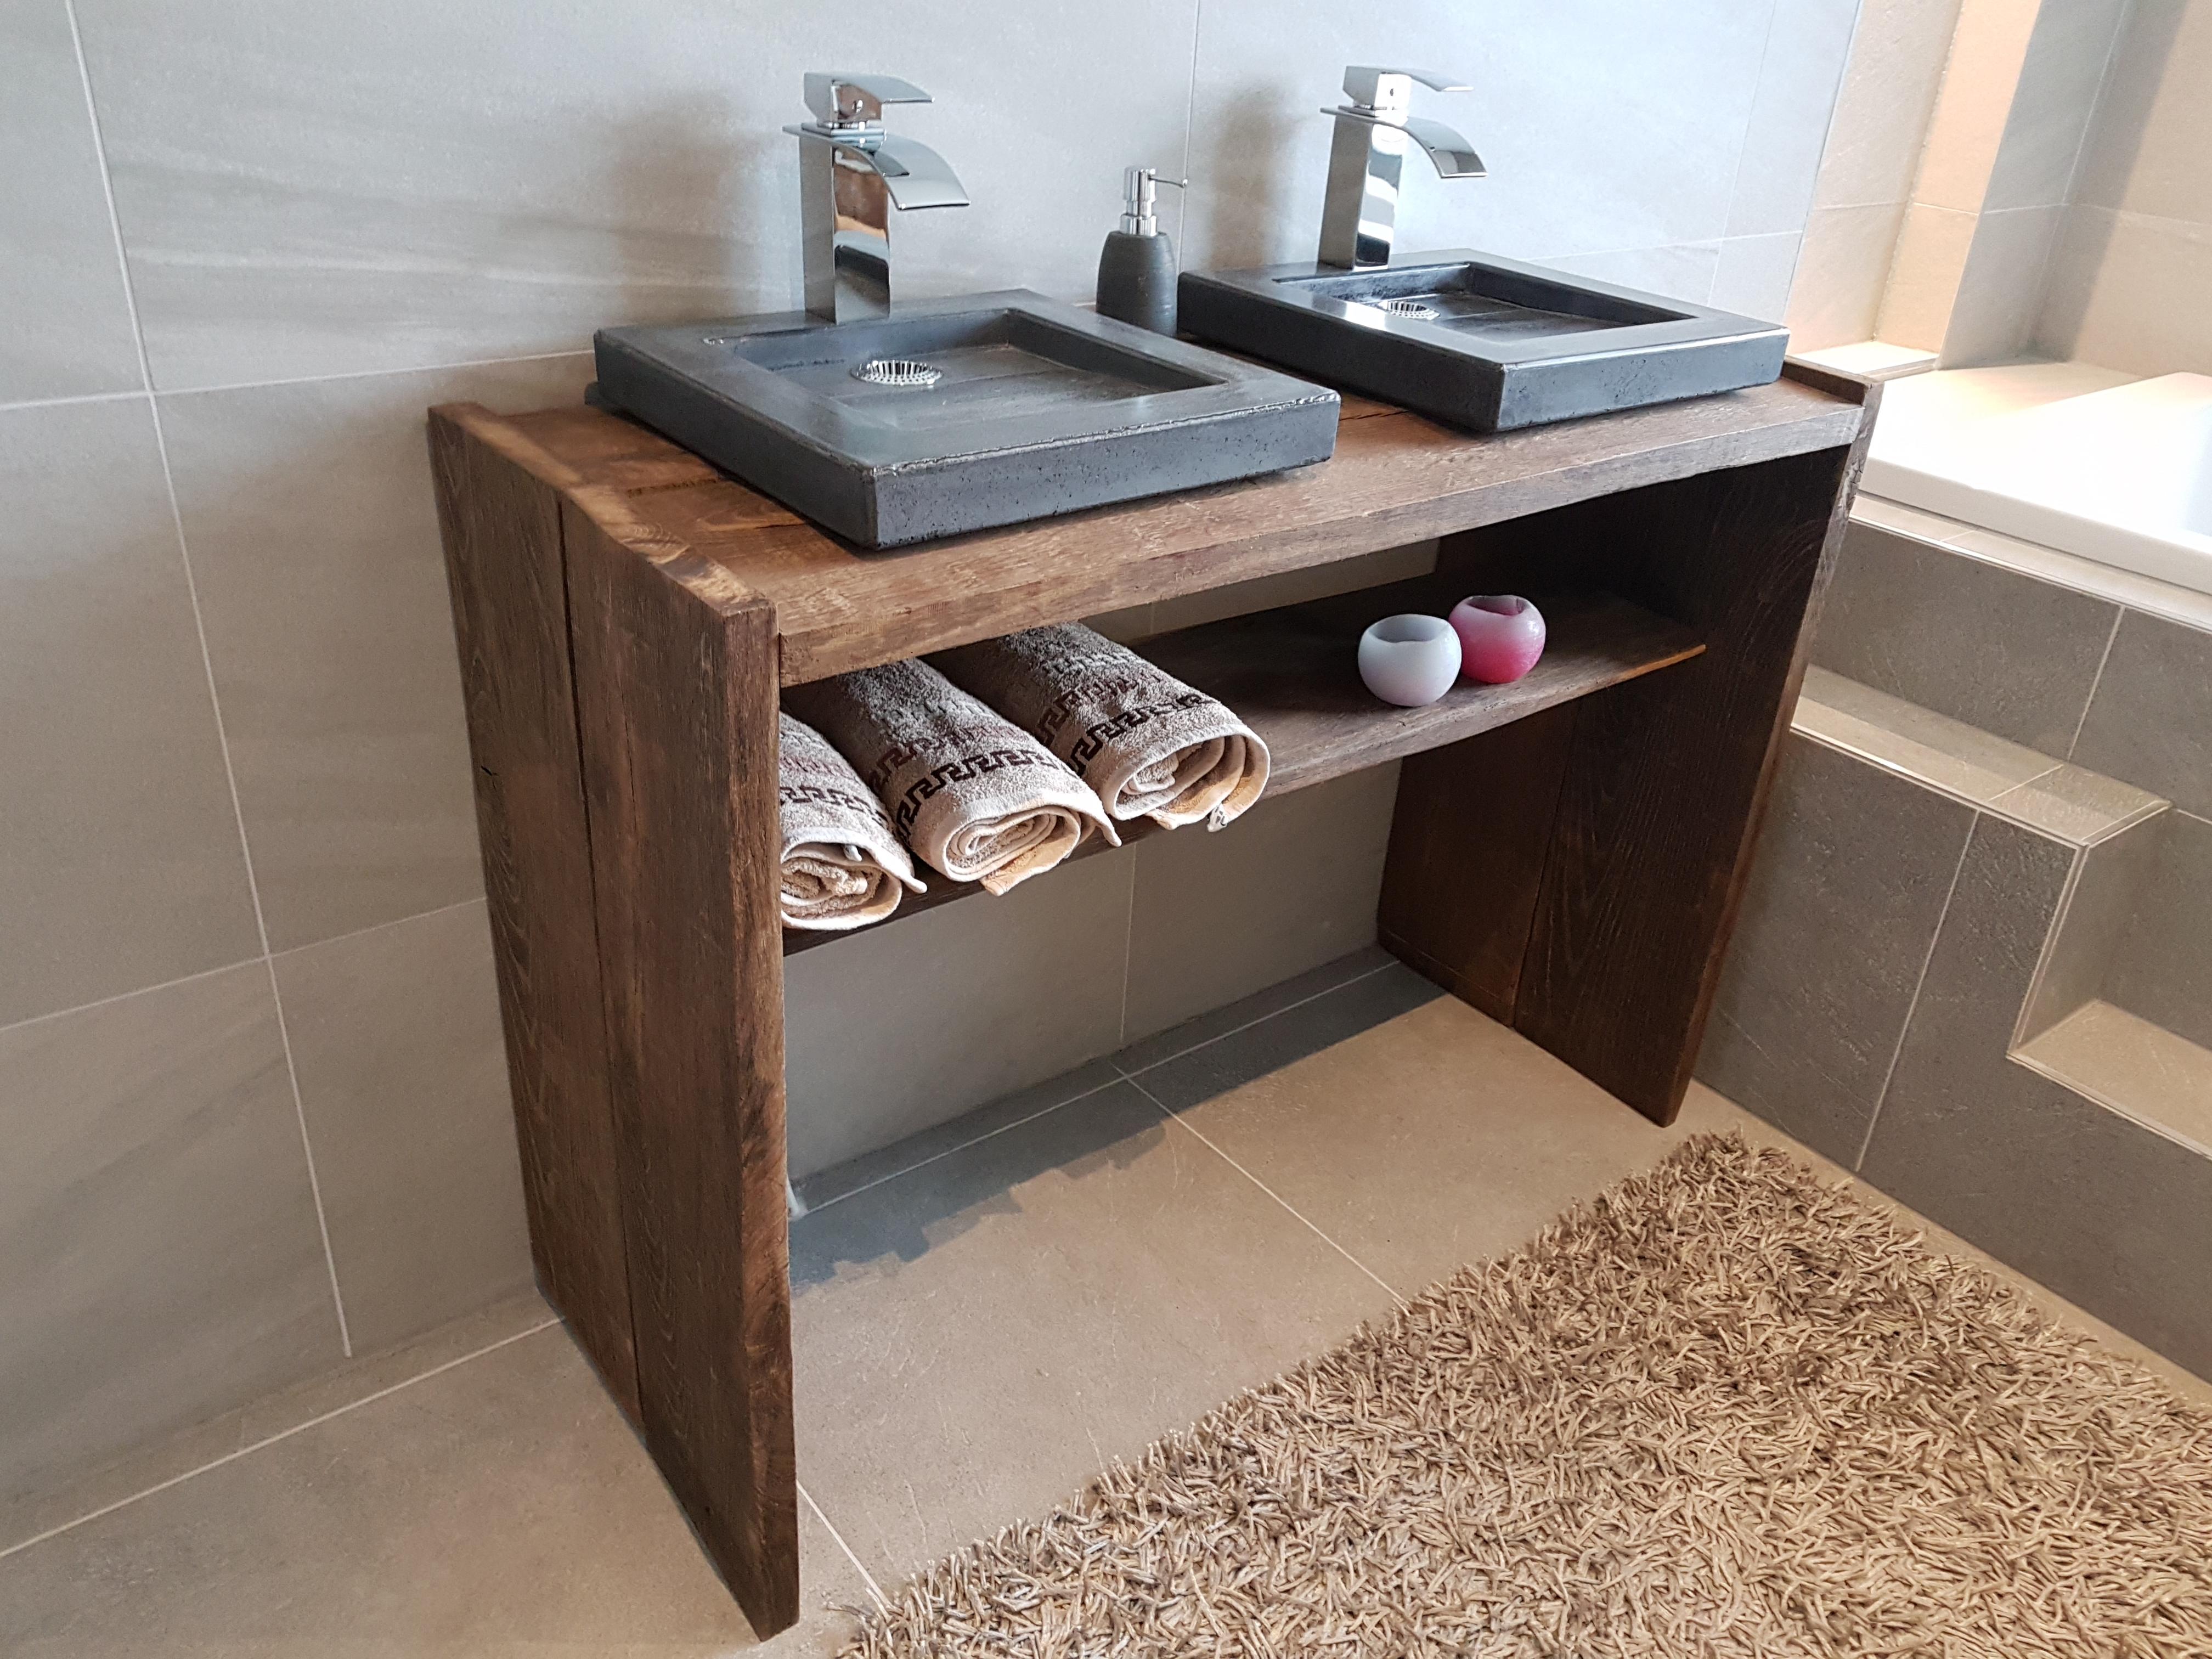 Badkamermeubel hout met betonnen wasbakken -